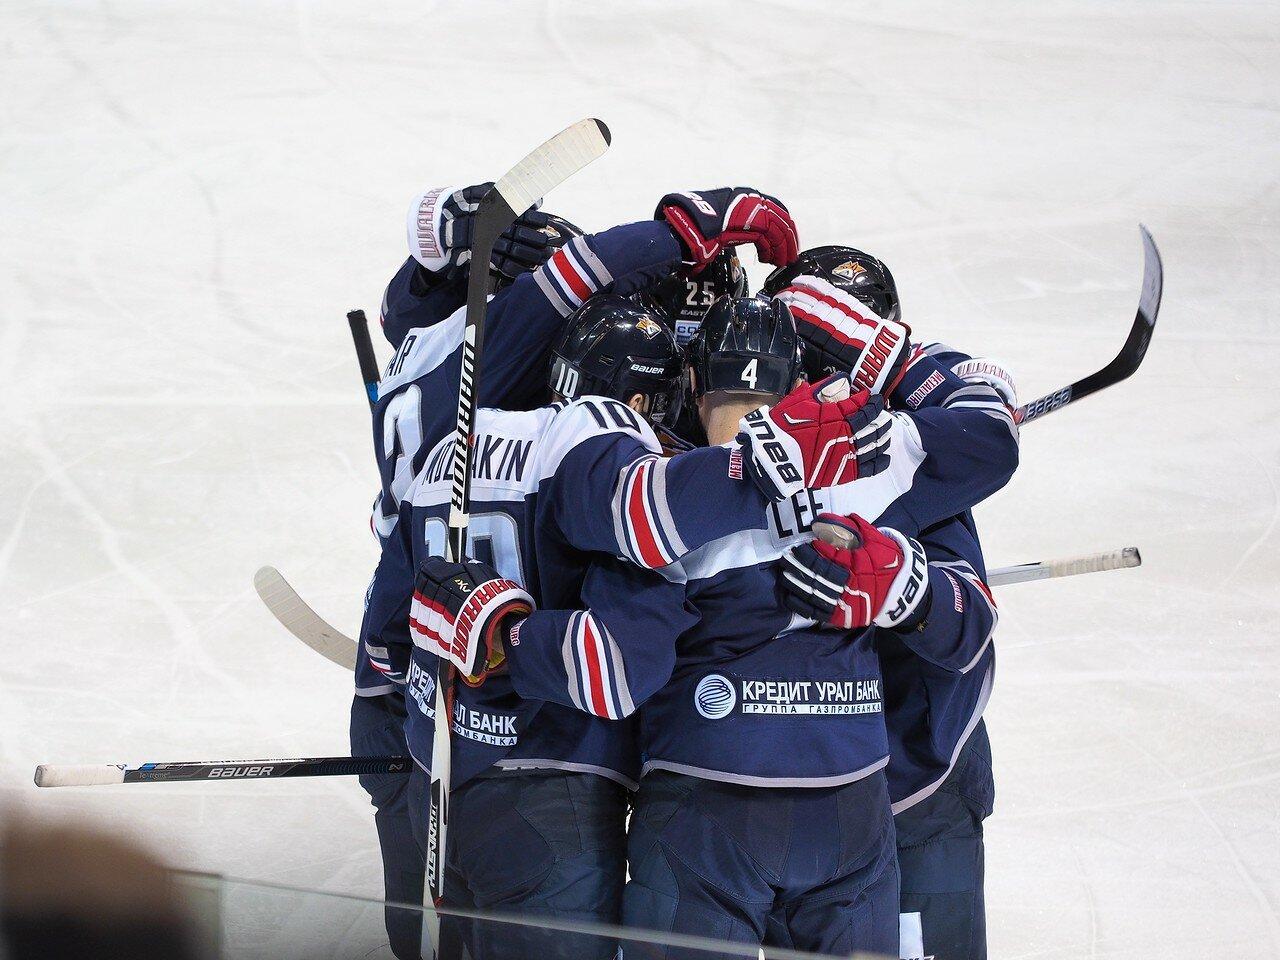 46Плей-офф 2016 Восток 1/2 Металлург - Сибирь 16.03.2016